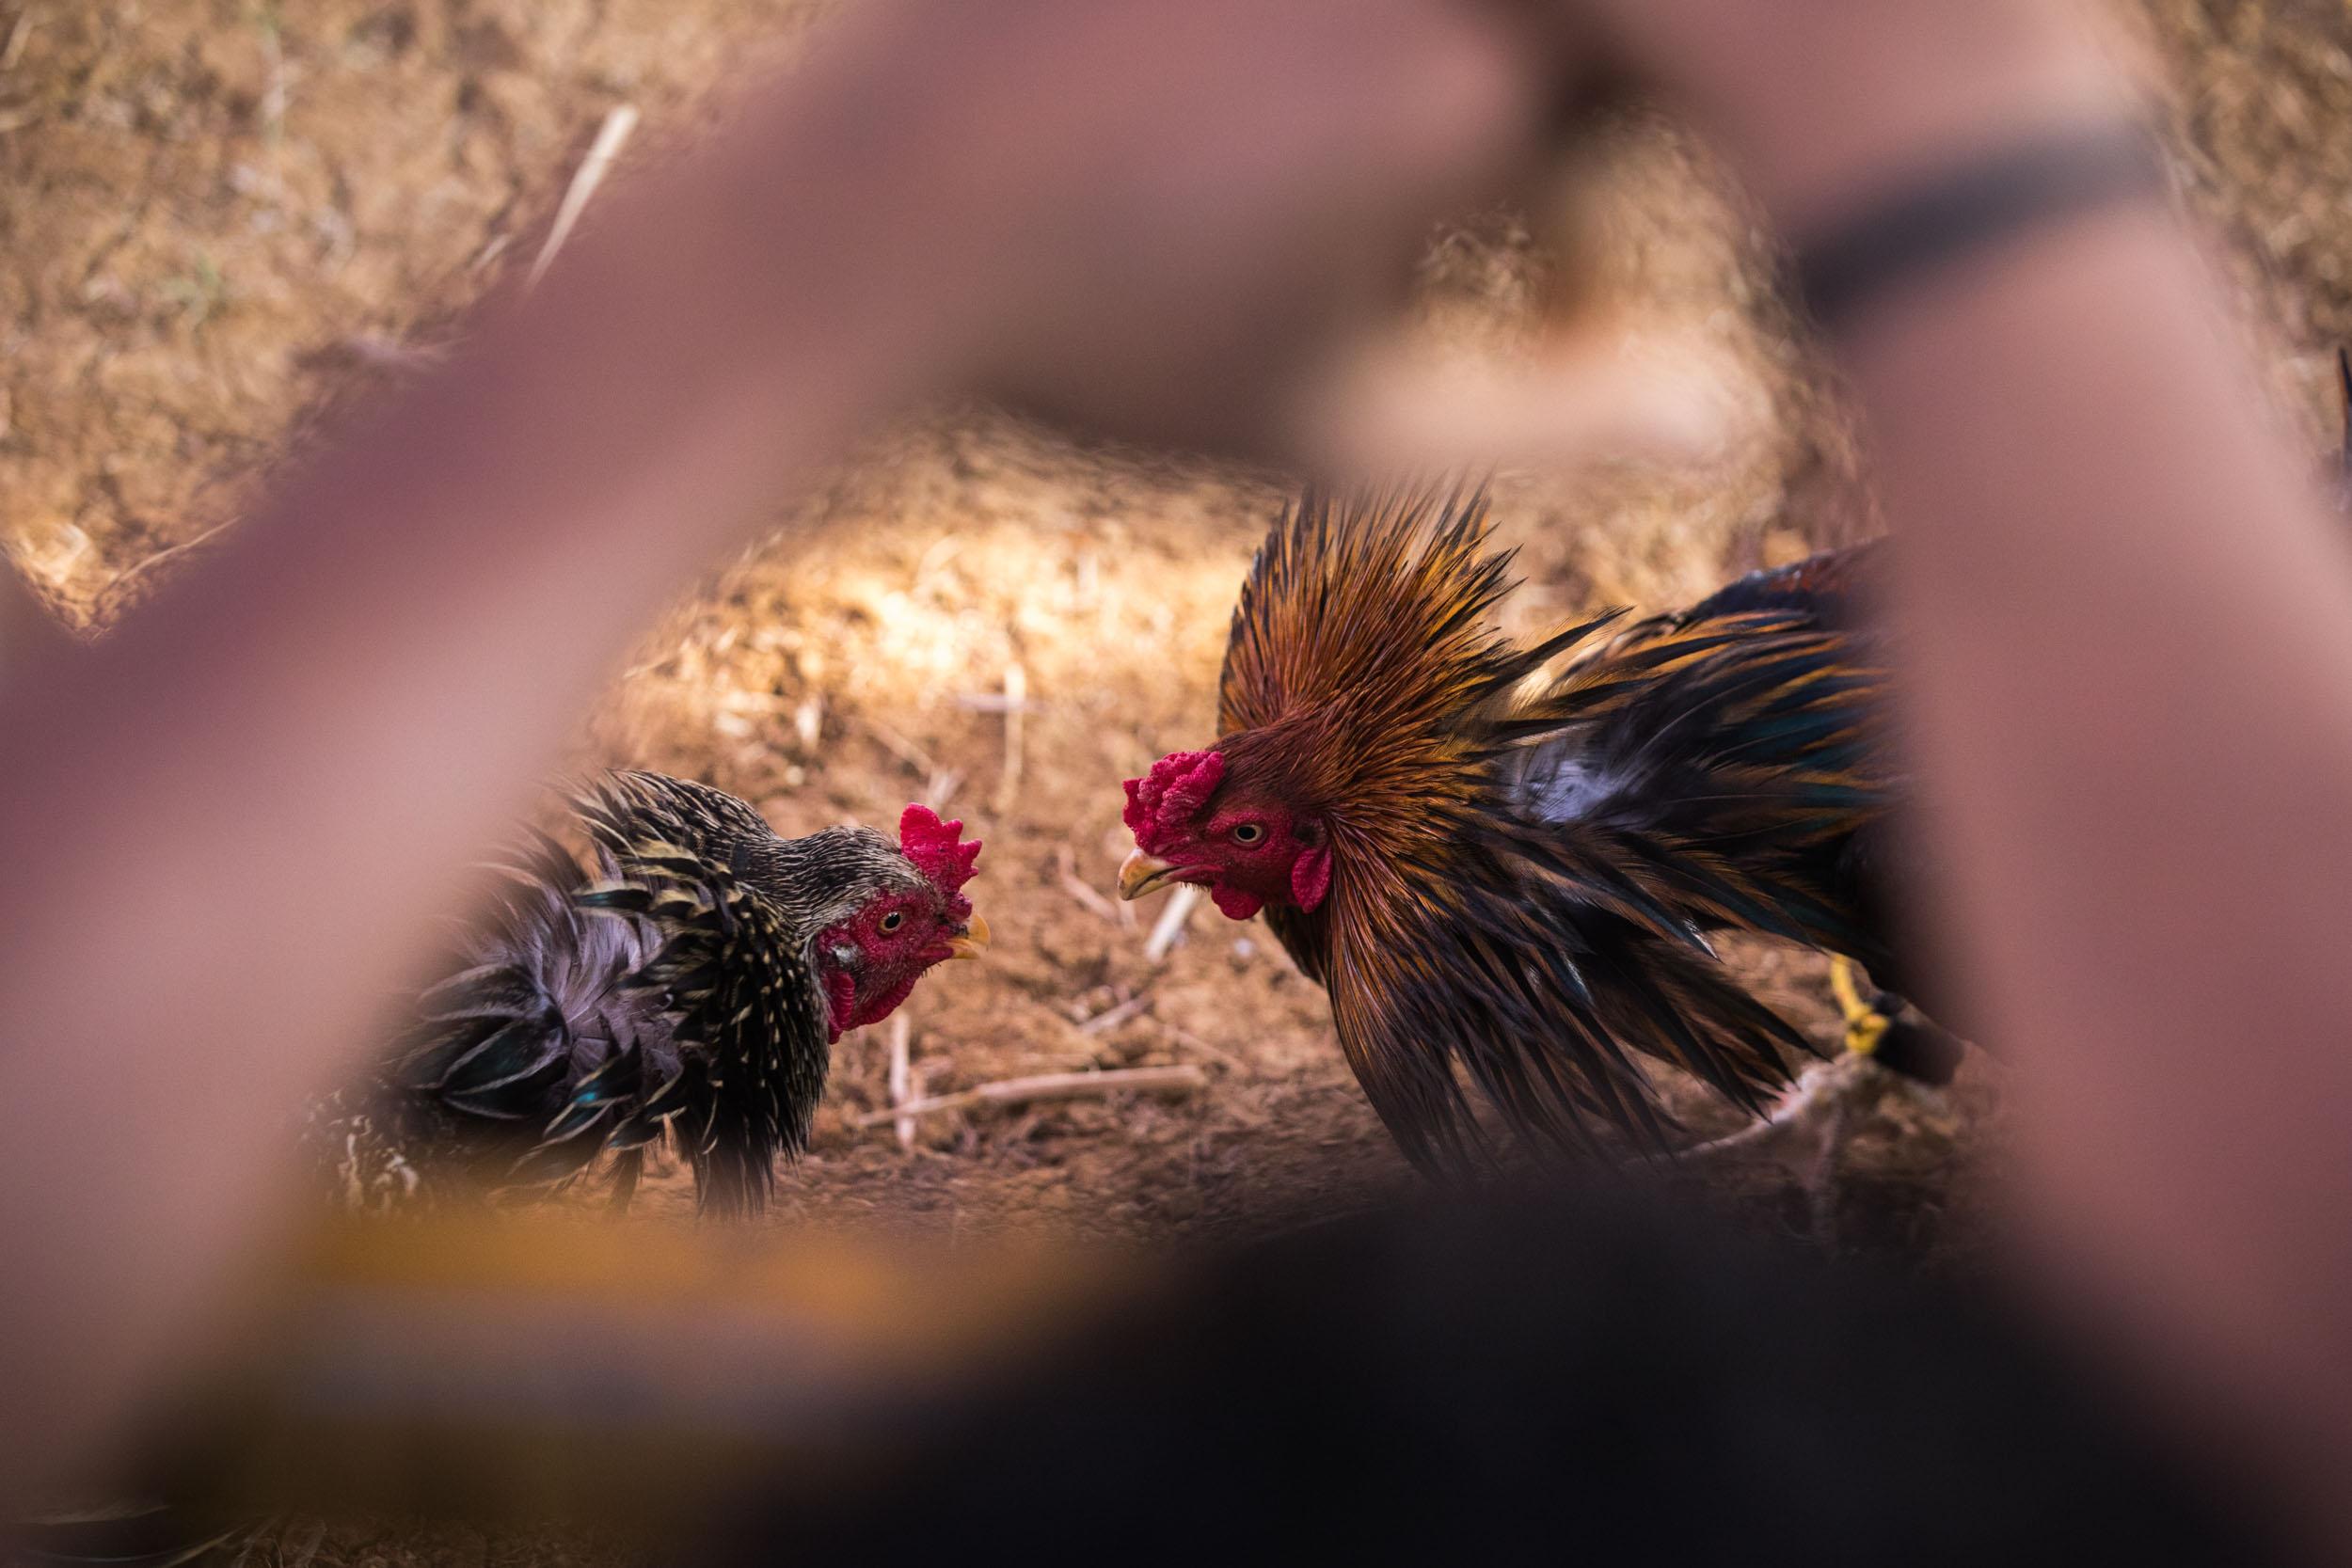 Giuliano_Berti_Chicken-Fight_India-6.jpg